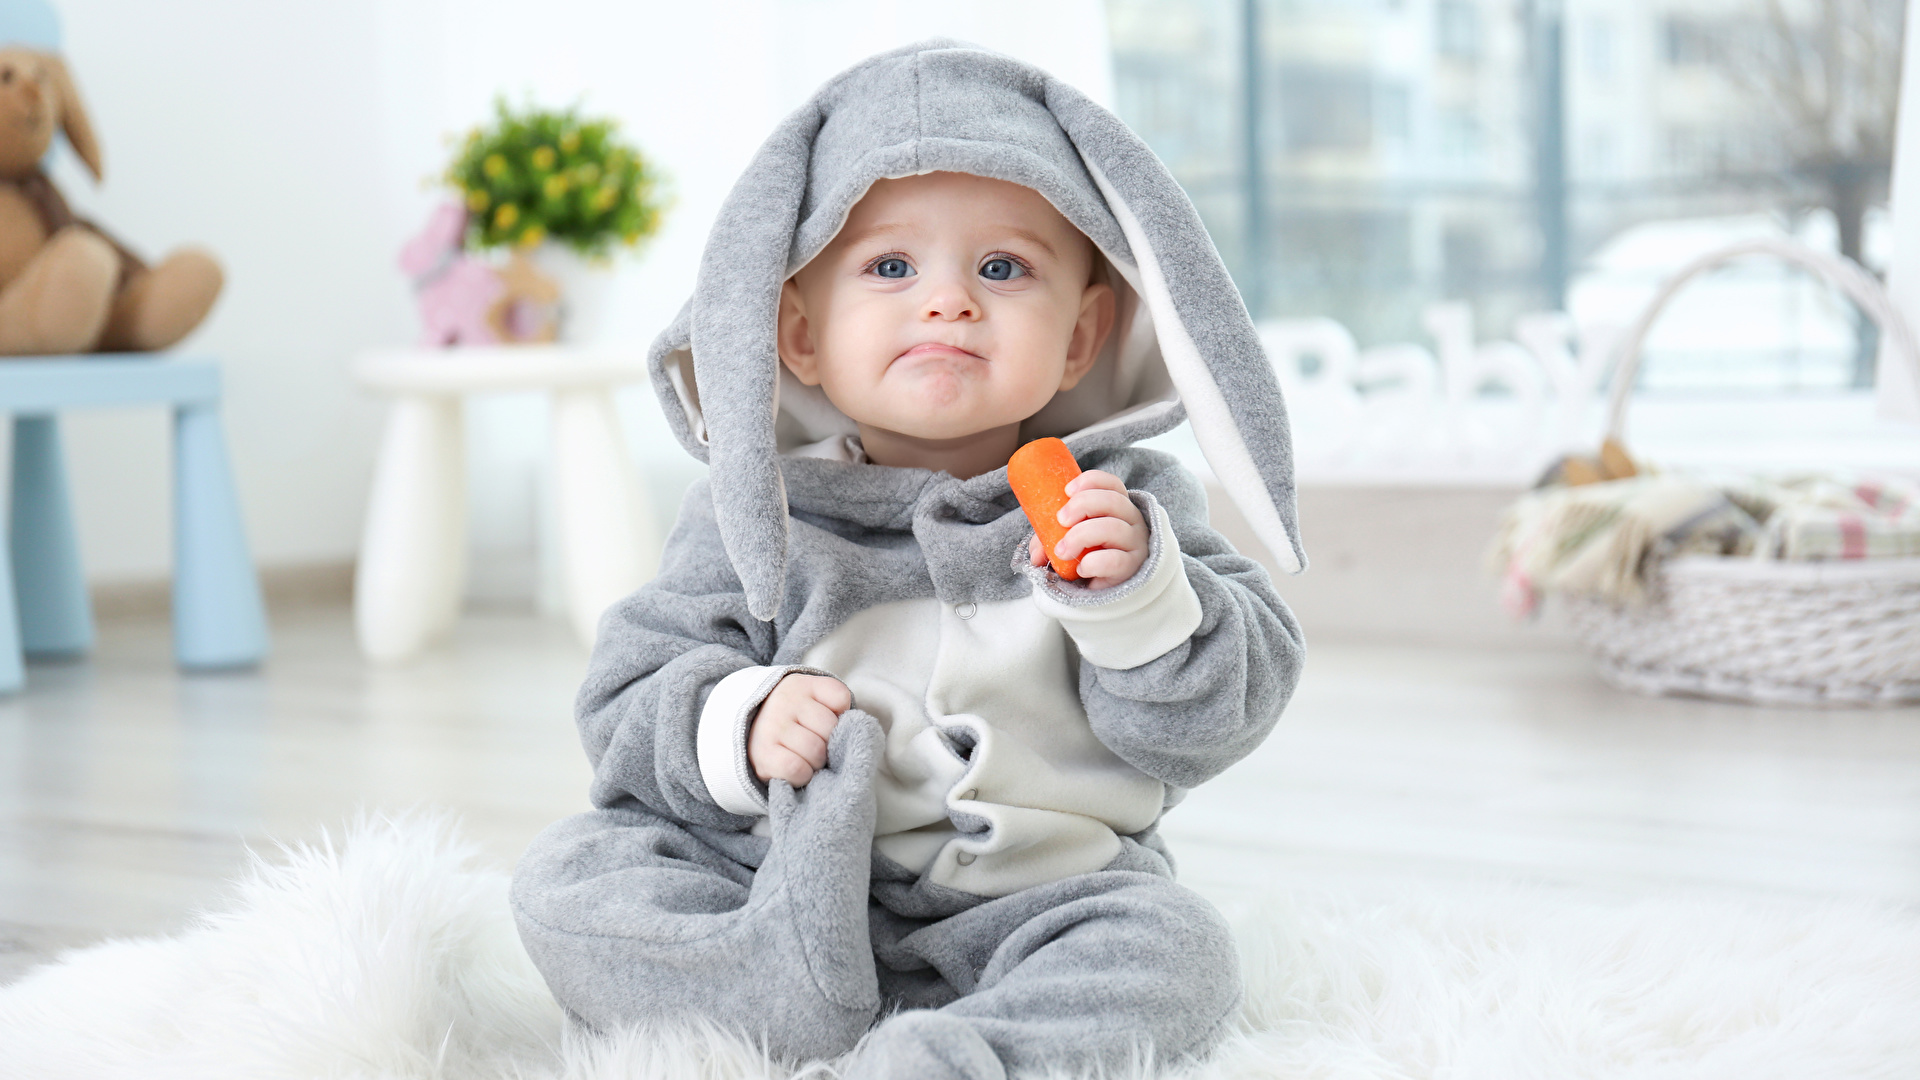 Fotos Ostern Baby Kaninchen Kinder Mohrrübe Uniform 1920x1080